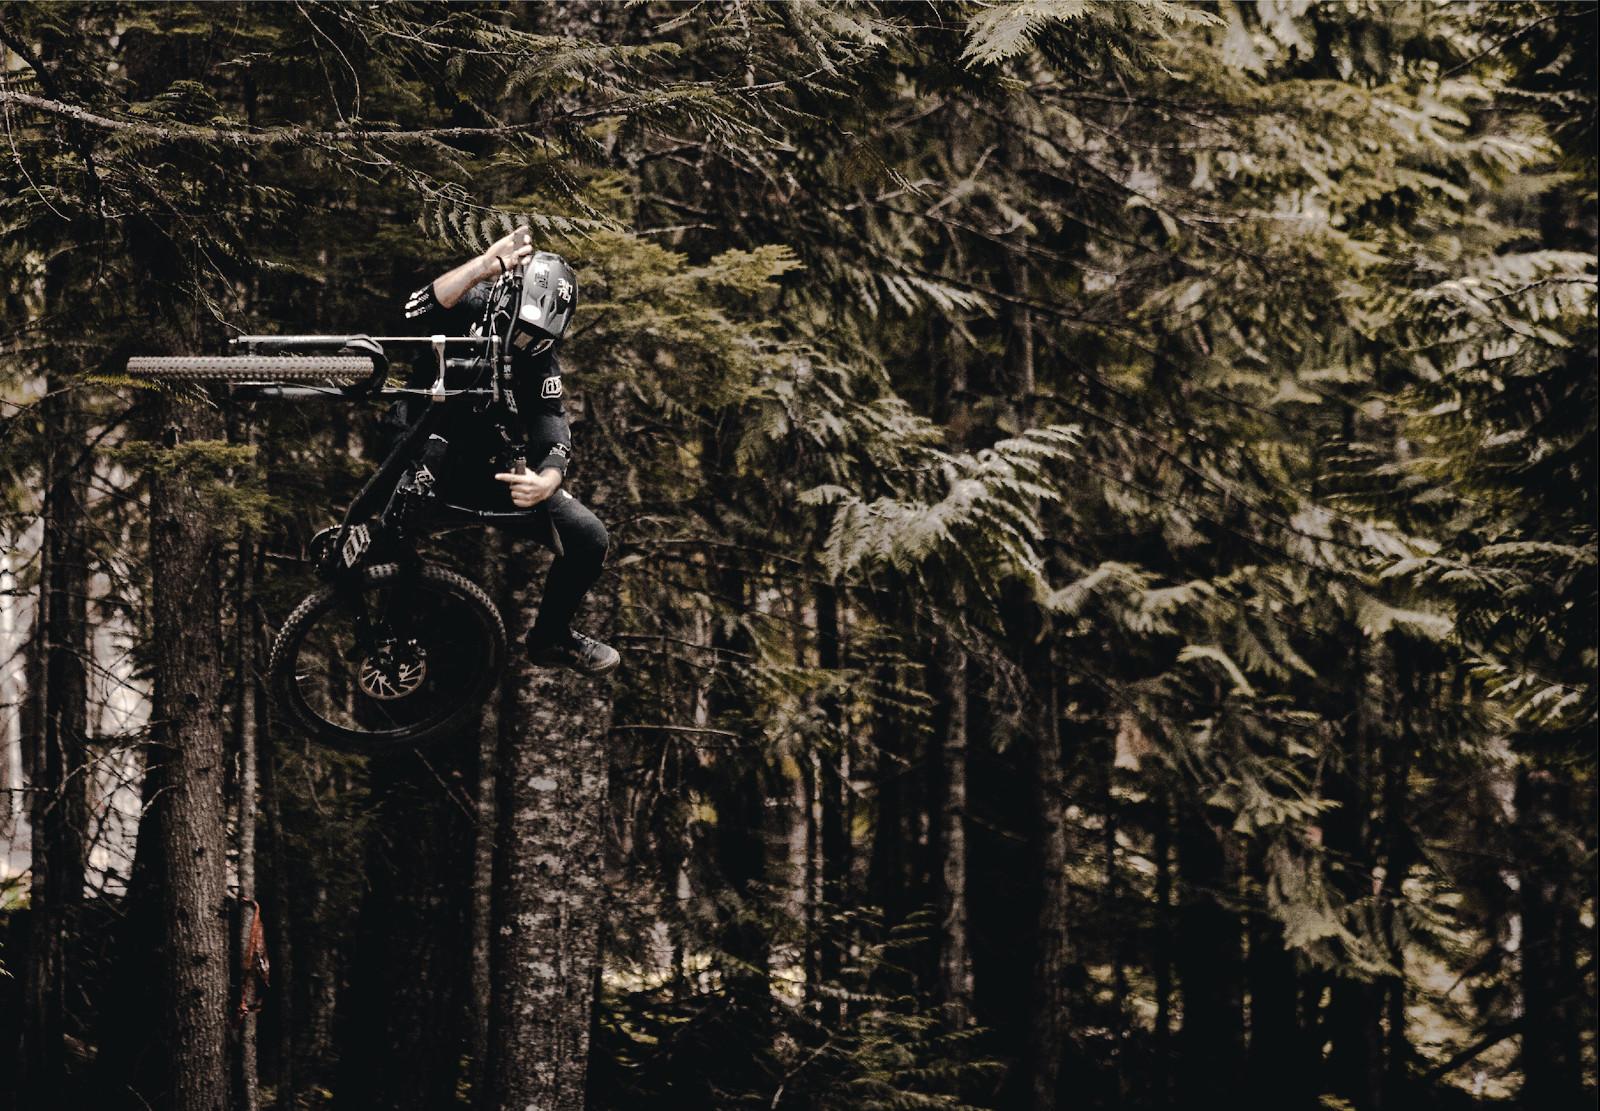 A Line Crusin' - DomKniight100 - Mountain Biking Pictures - Vital MTB